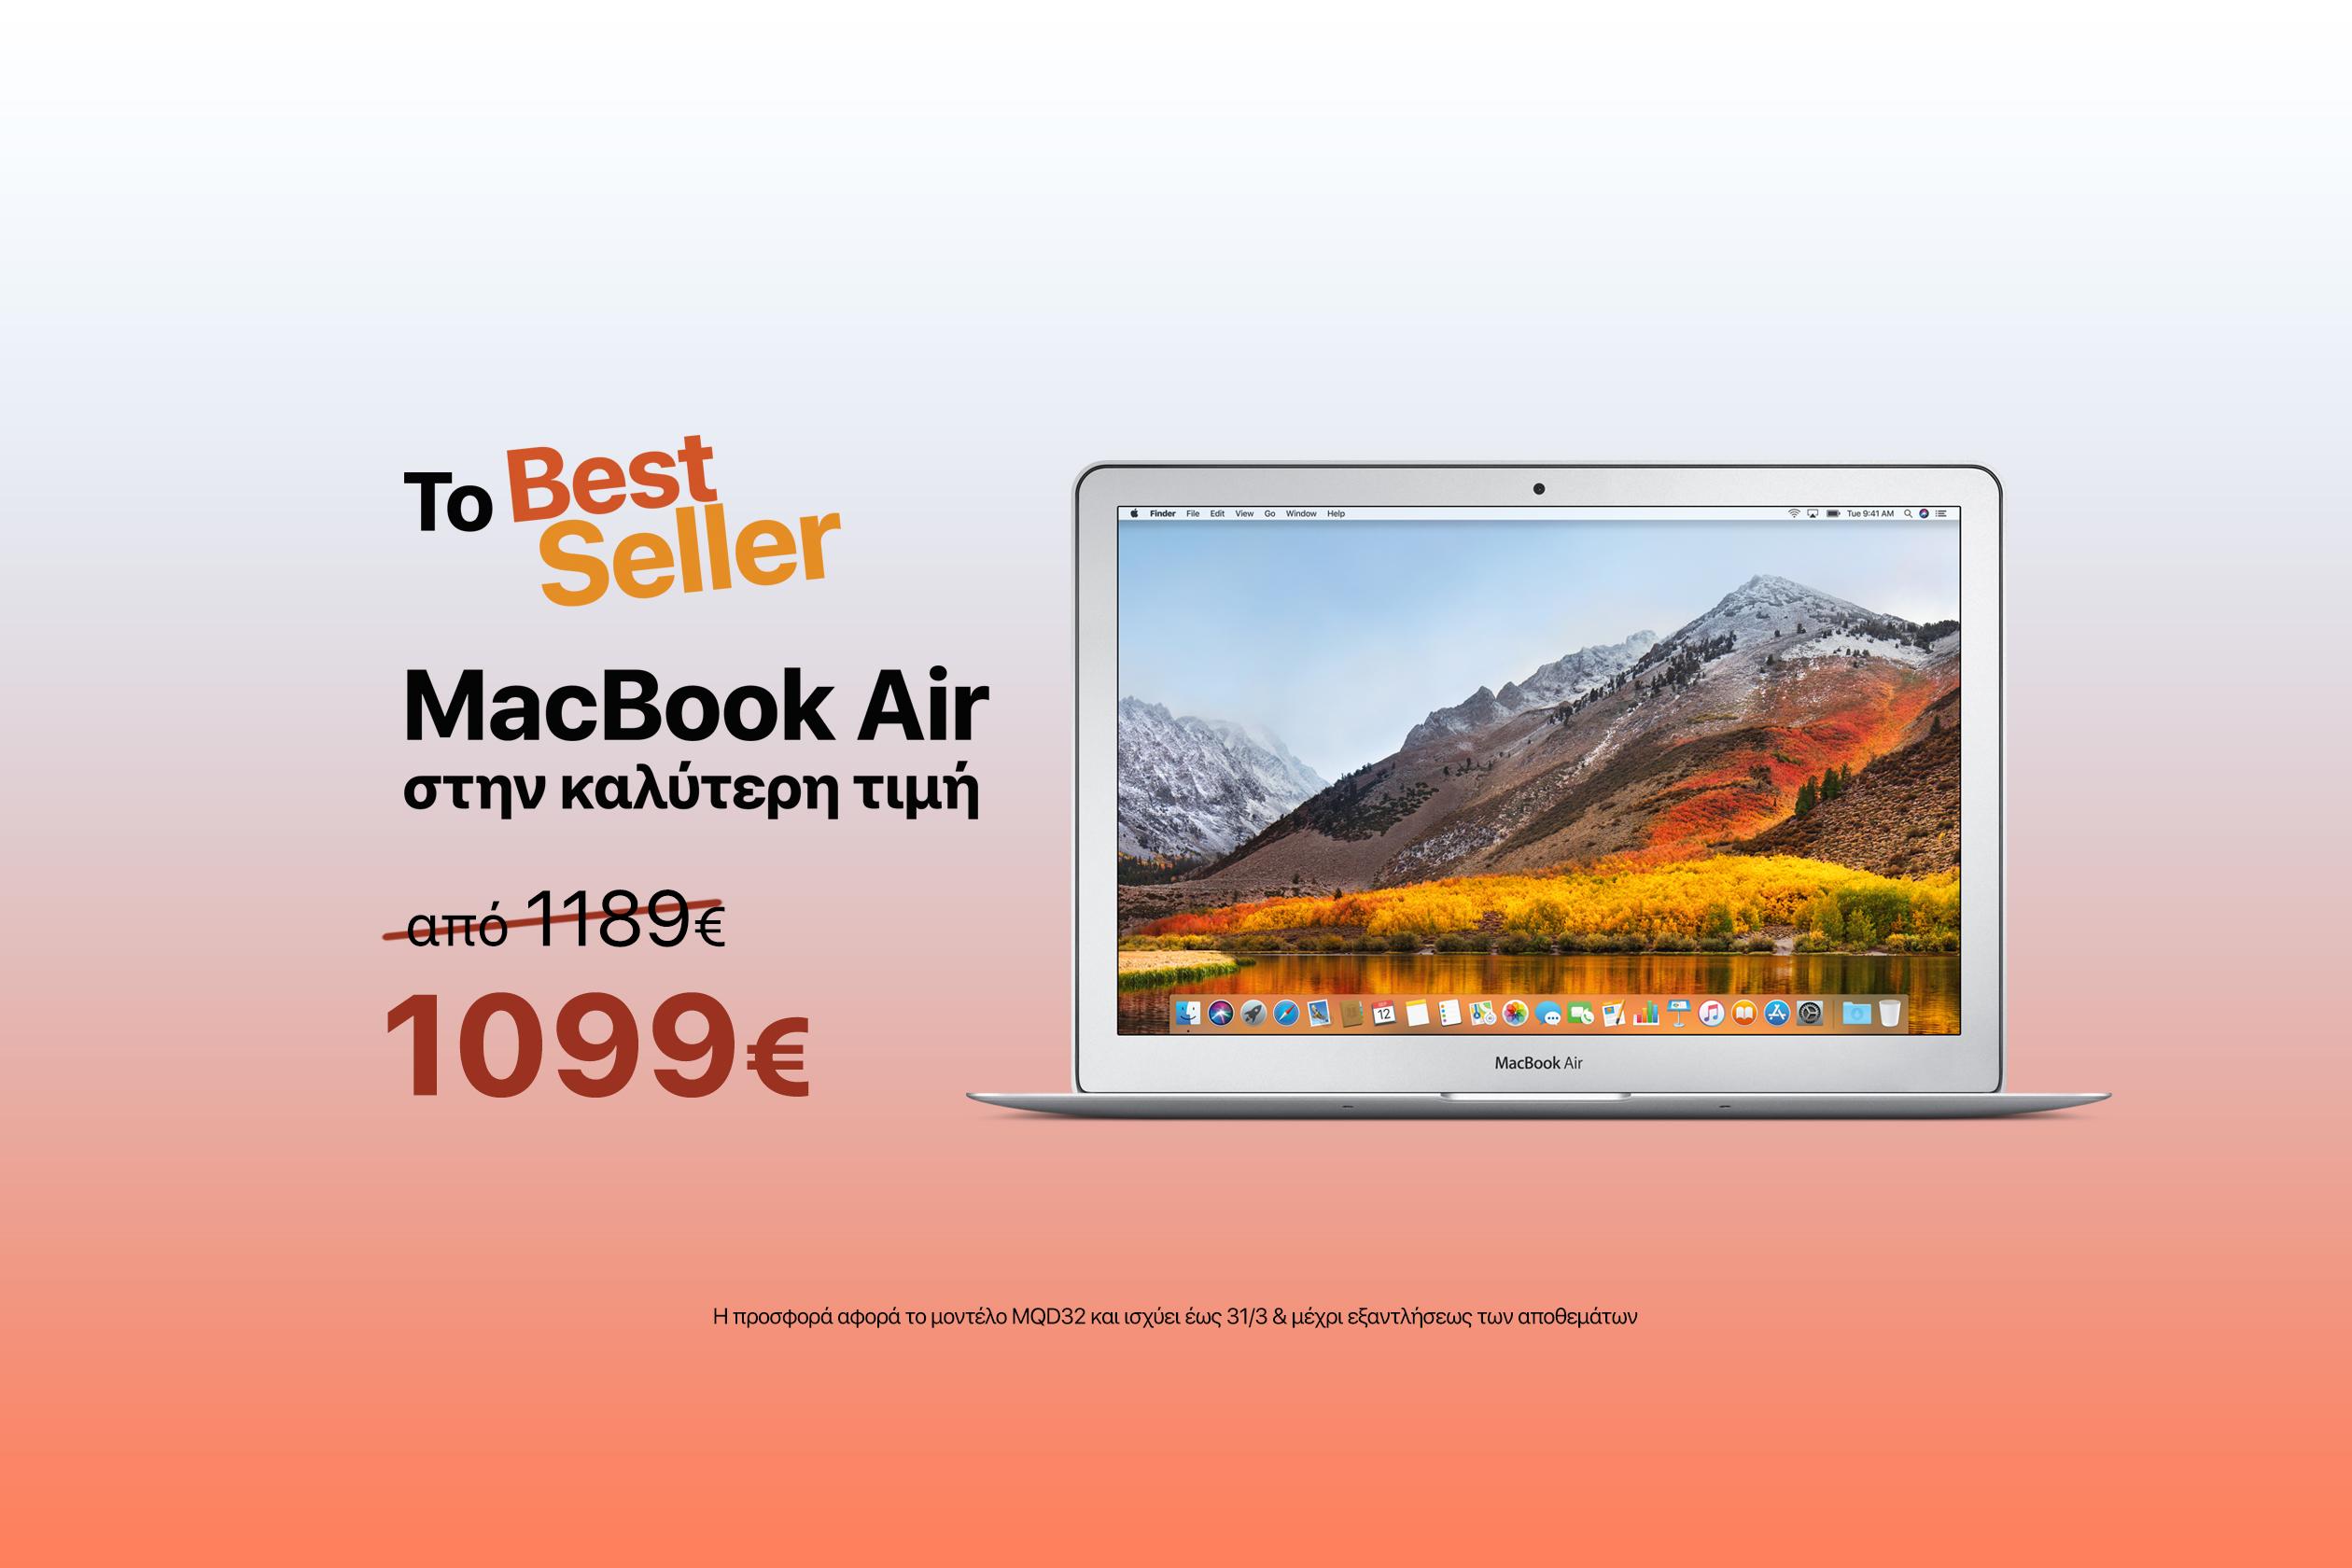 MacBook Air Promo